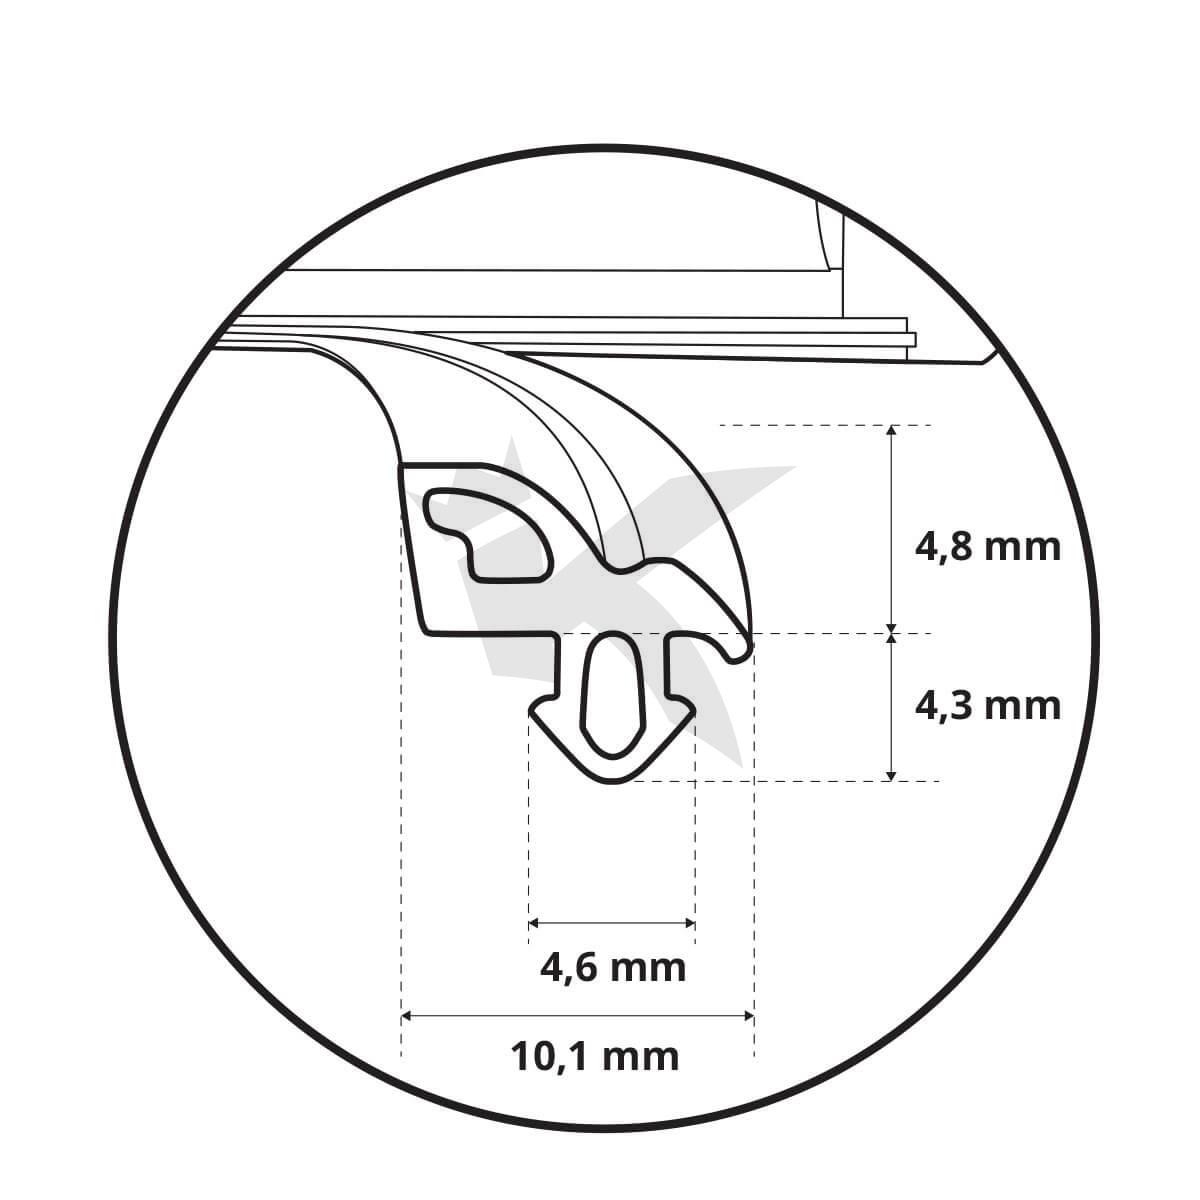 fensterdichtung dichtband fenster t rdichtung gummidichtung kunststofffenster ebay. Black Bedroom Furniture Sets. Home Design Ideas